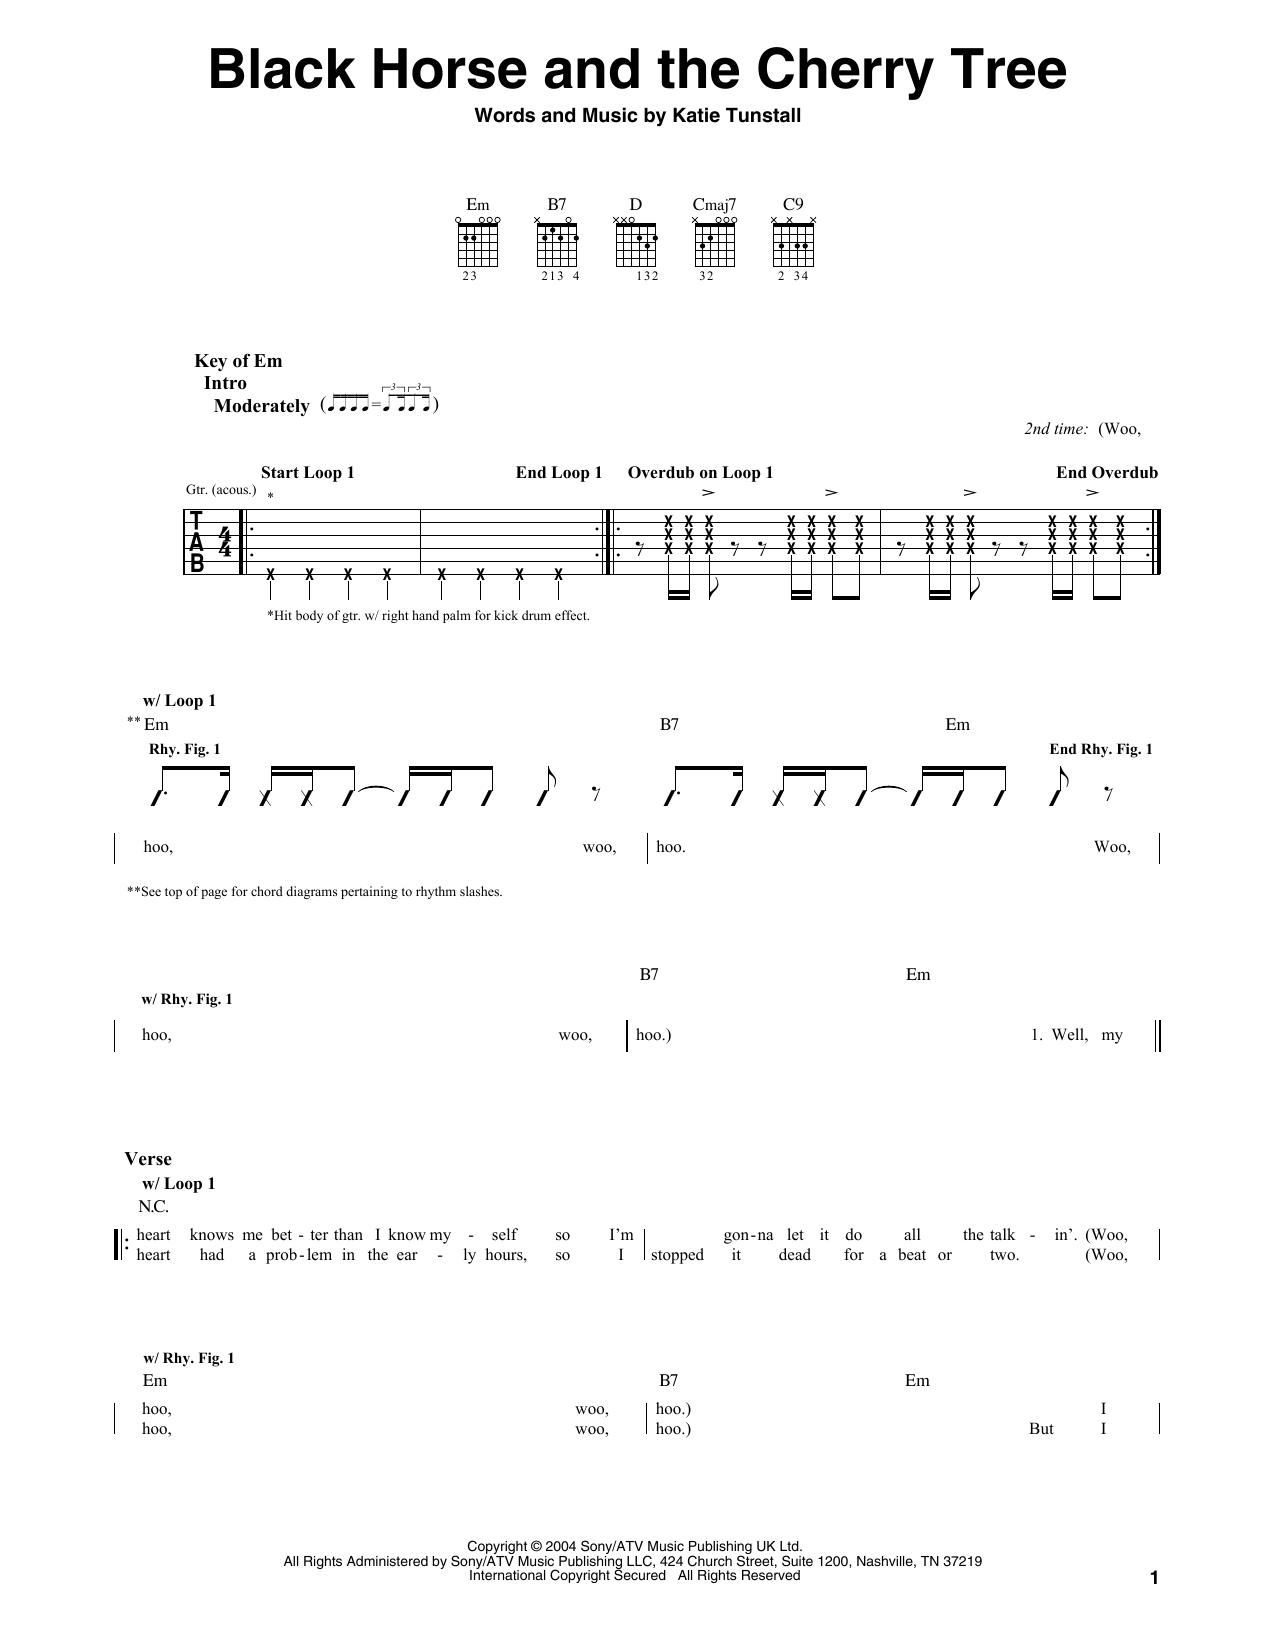 Sheet Music Digital Files To Print Licensed Katie Tunstall Digital